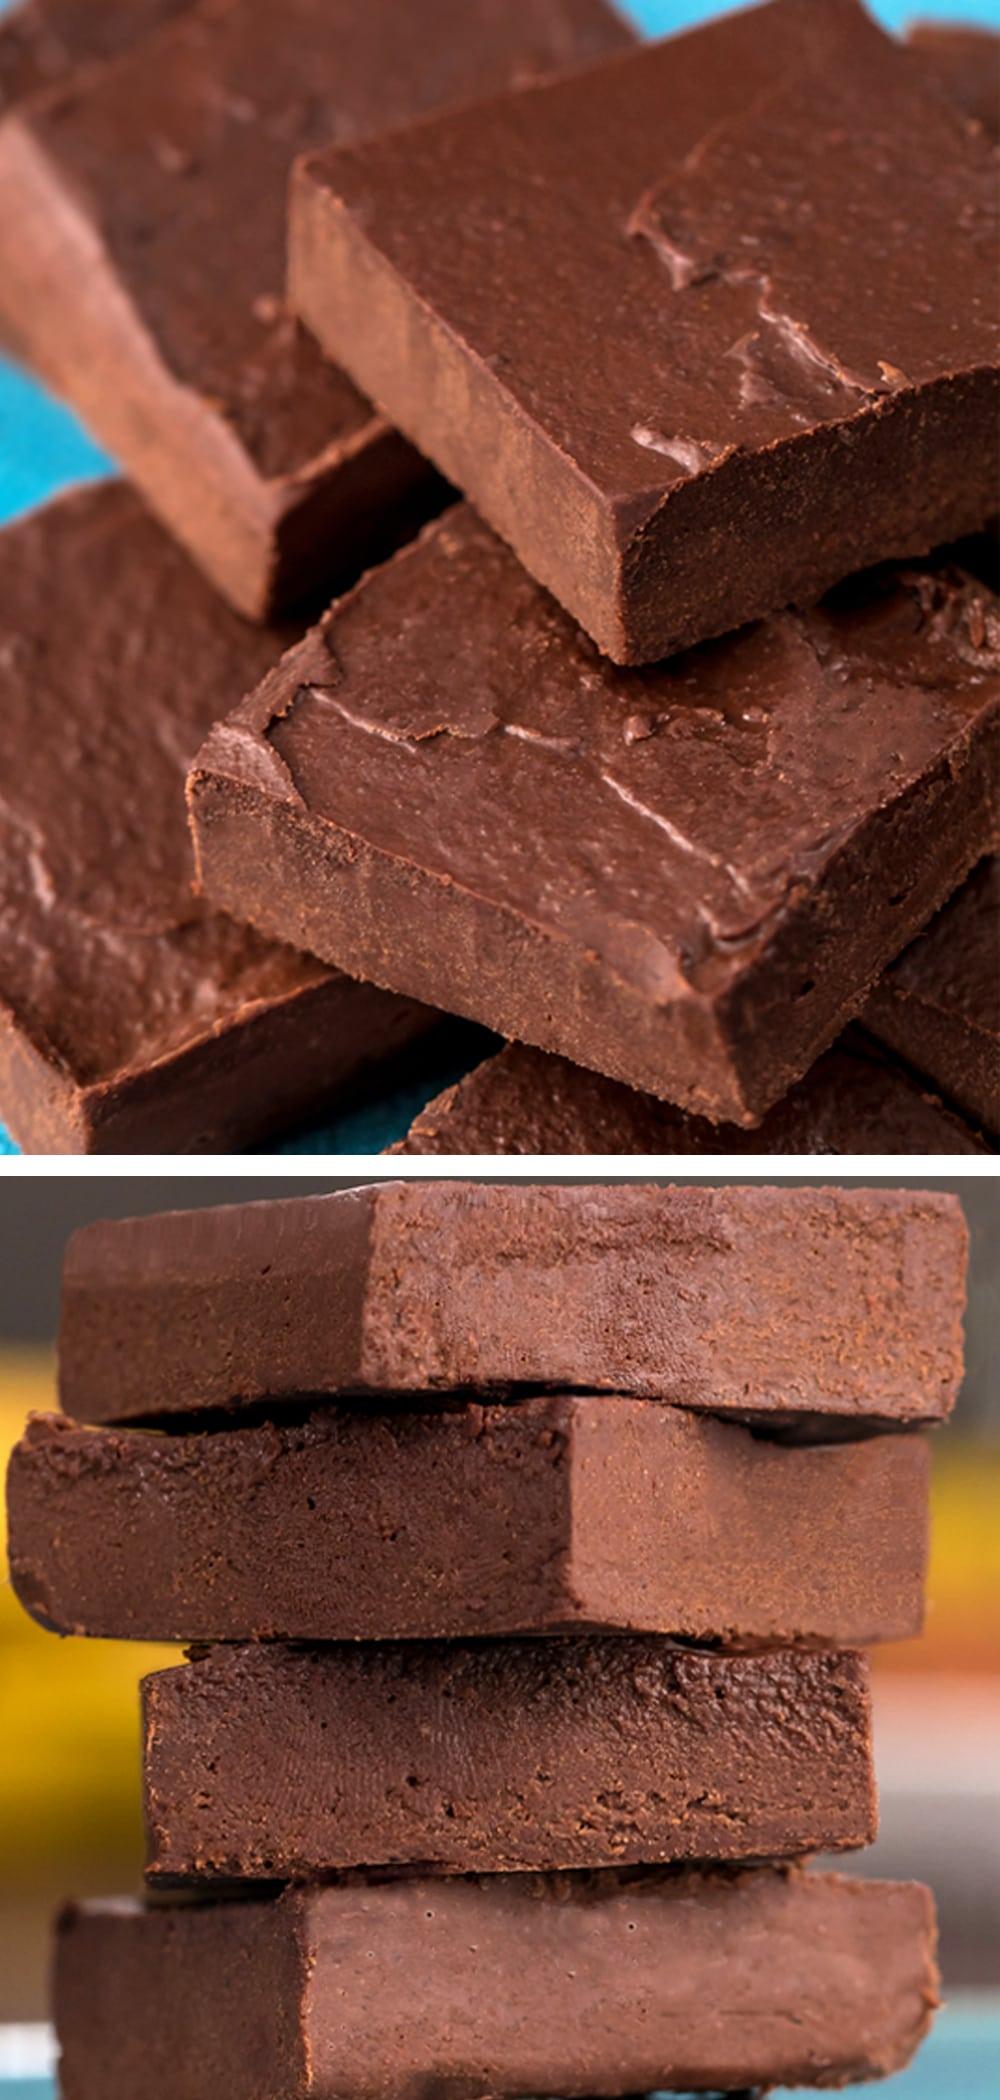 Chocolate Fudge Saudável - Katie Coberta de Chocolate 2